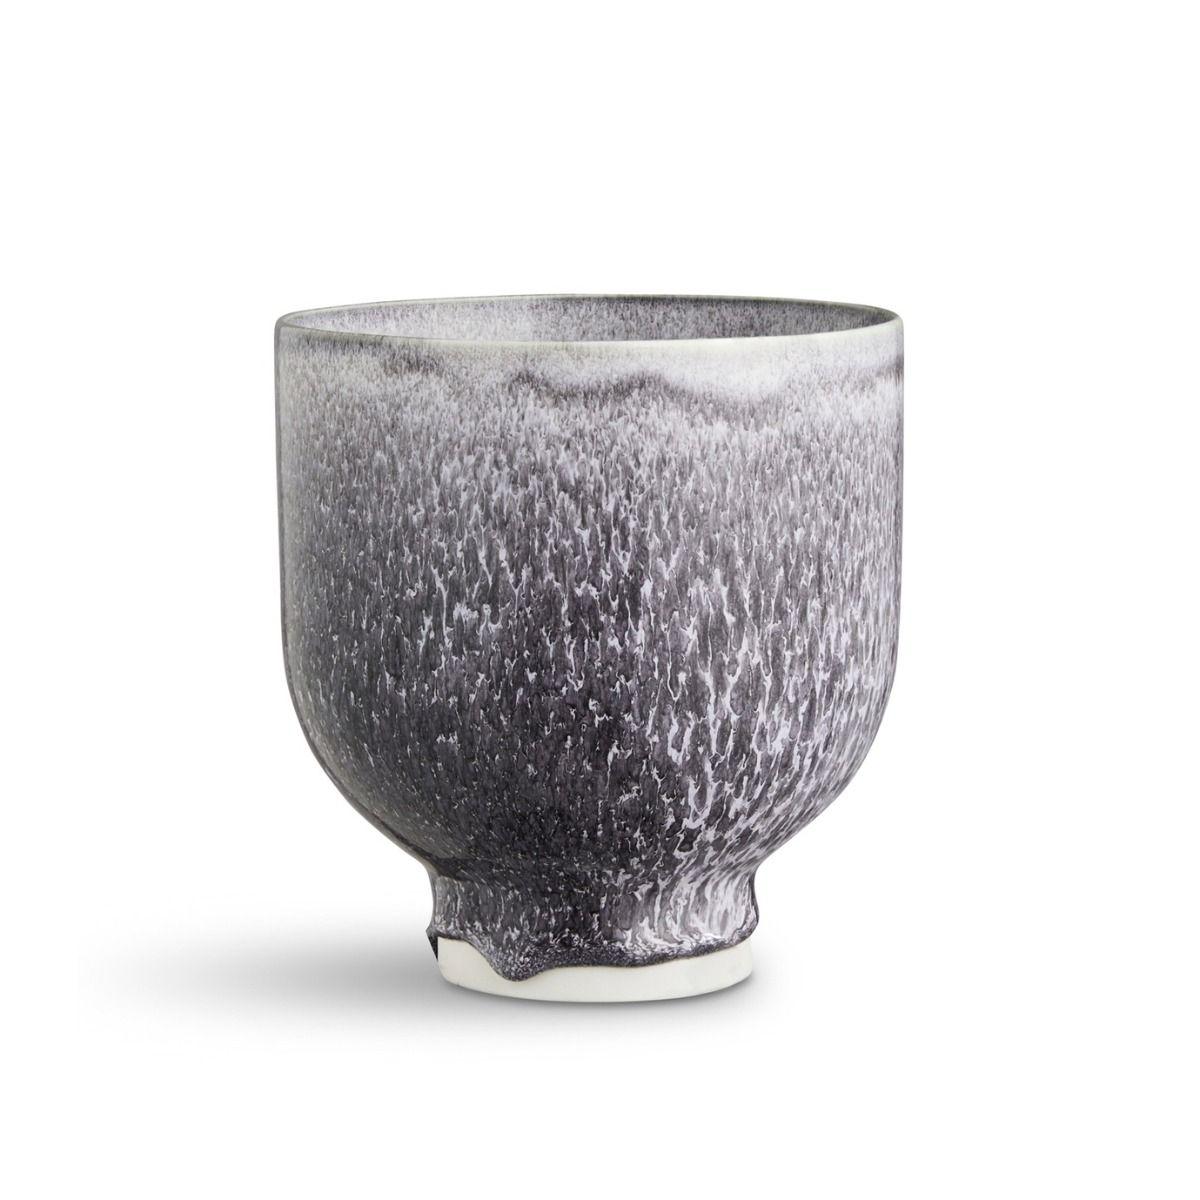 kahler unico flower pot